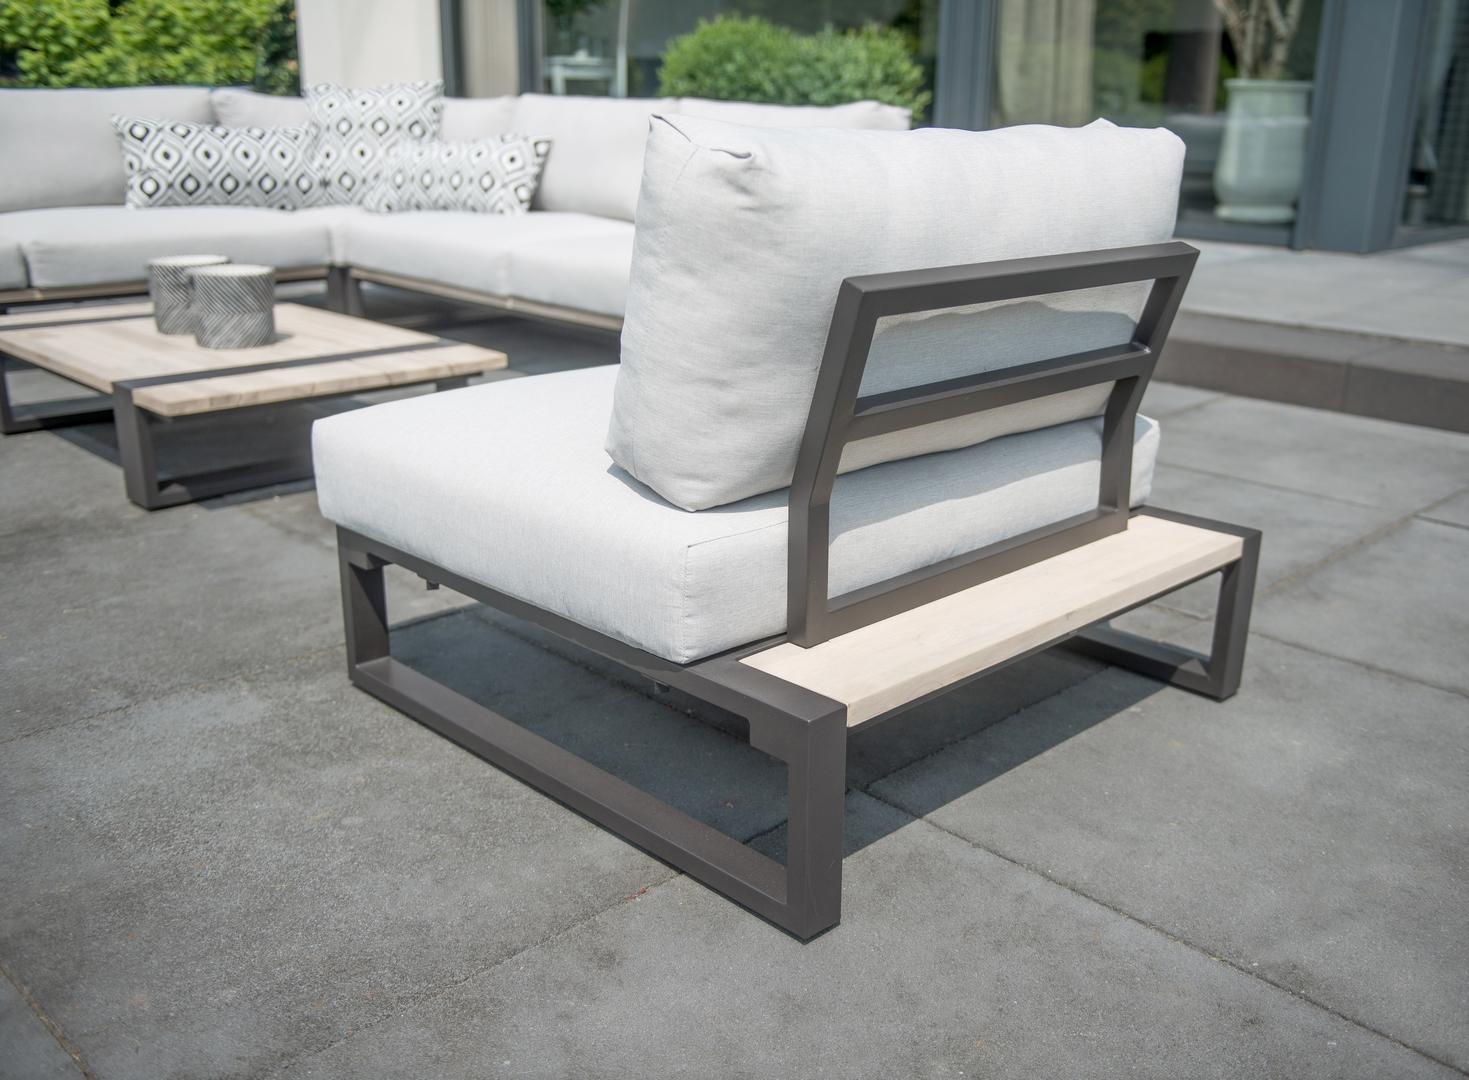 Pleasant 4 Seasons Outdoor Duke Loungeset Fc Tuinmeubelen Forskolin Free Trial Chair Design Images Forskolin Free Trialorg